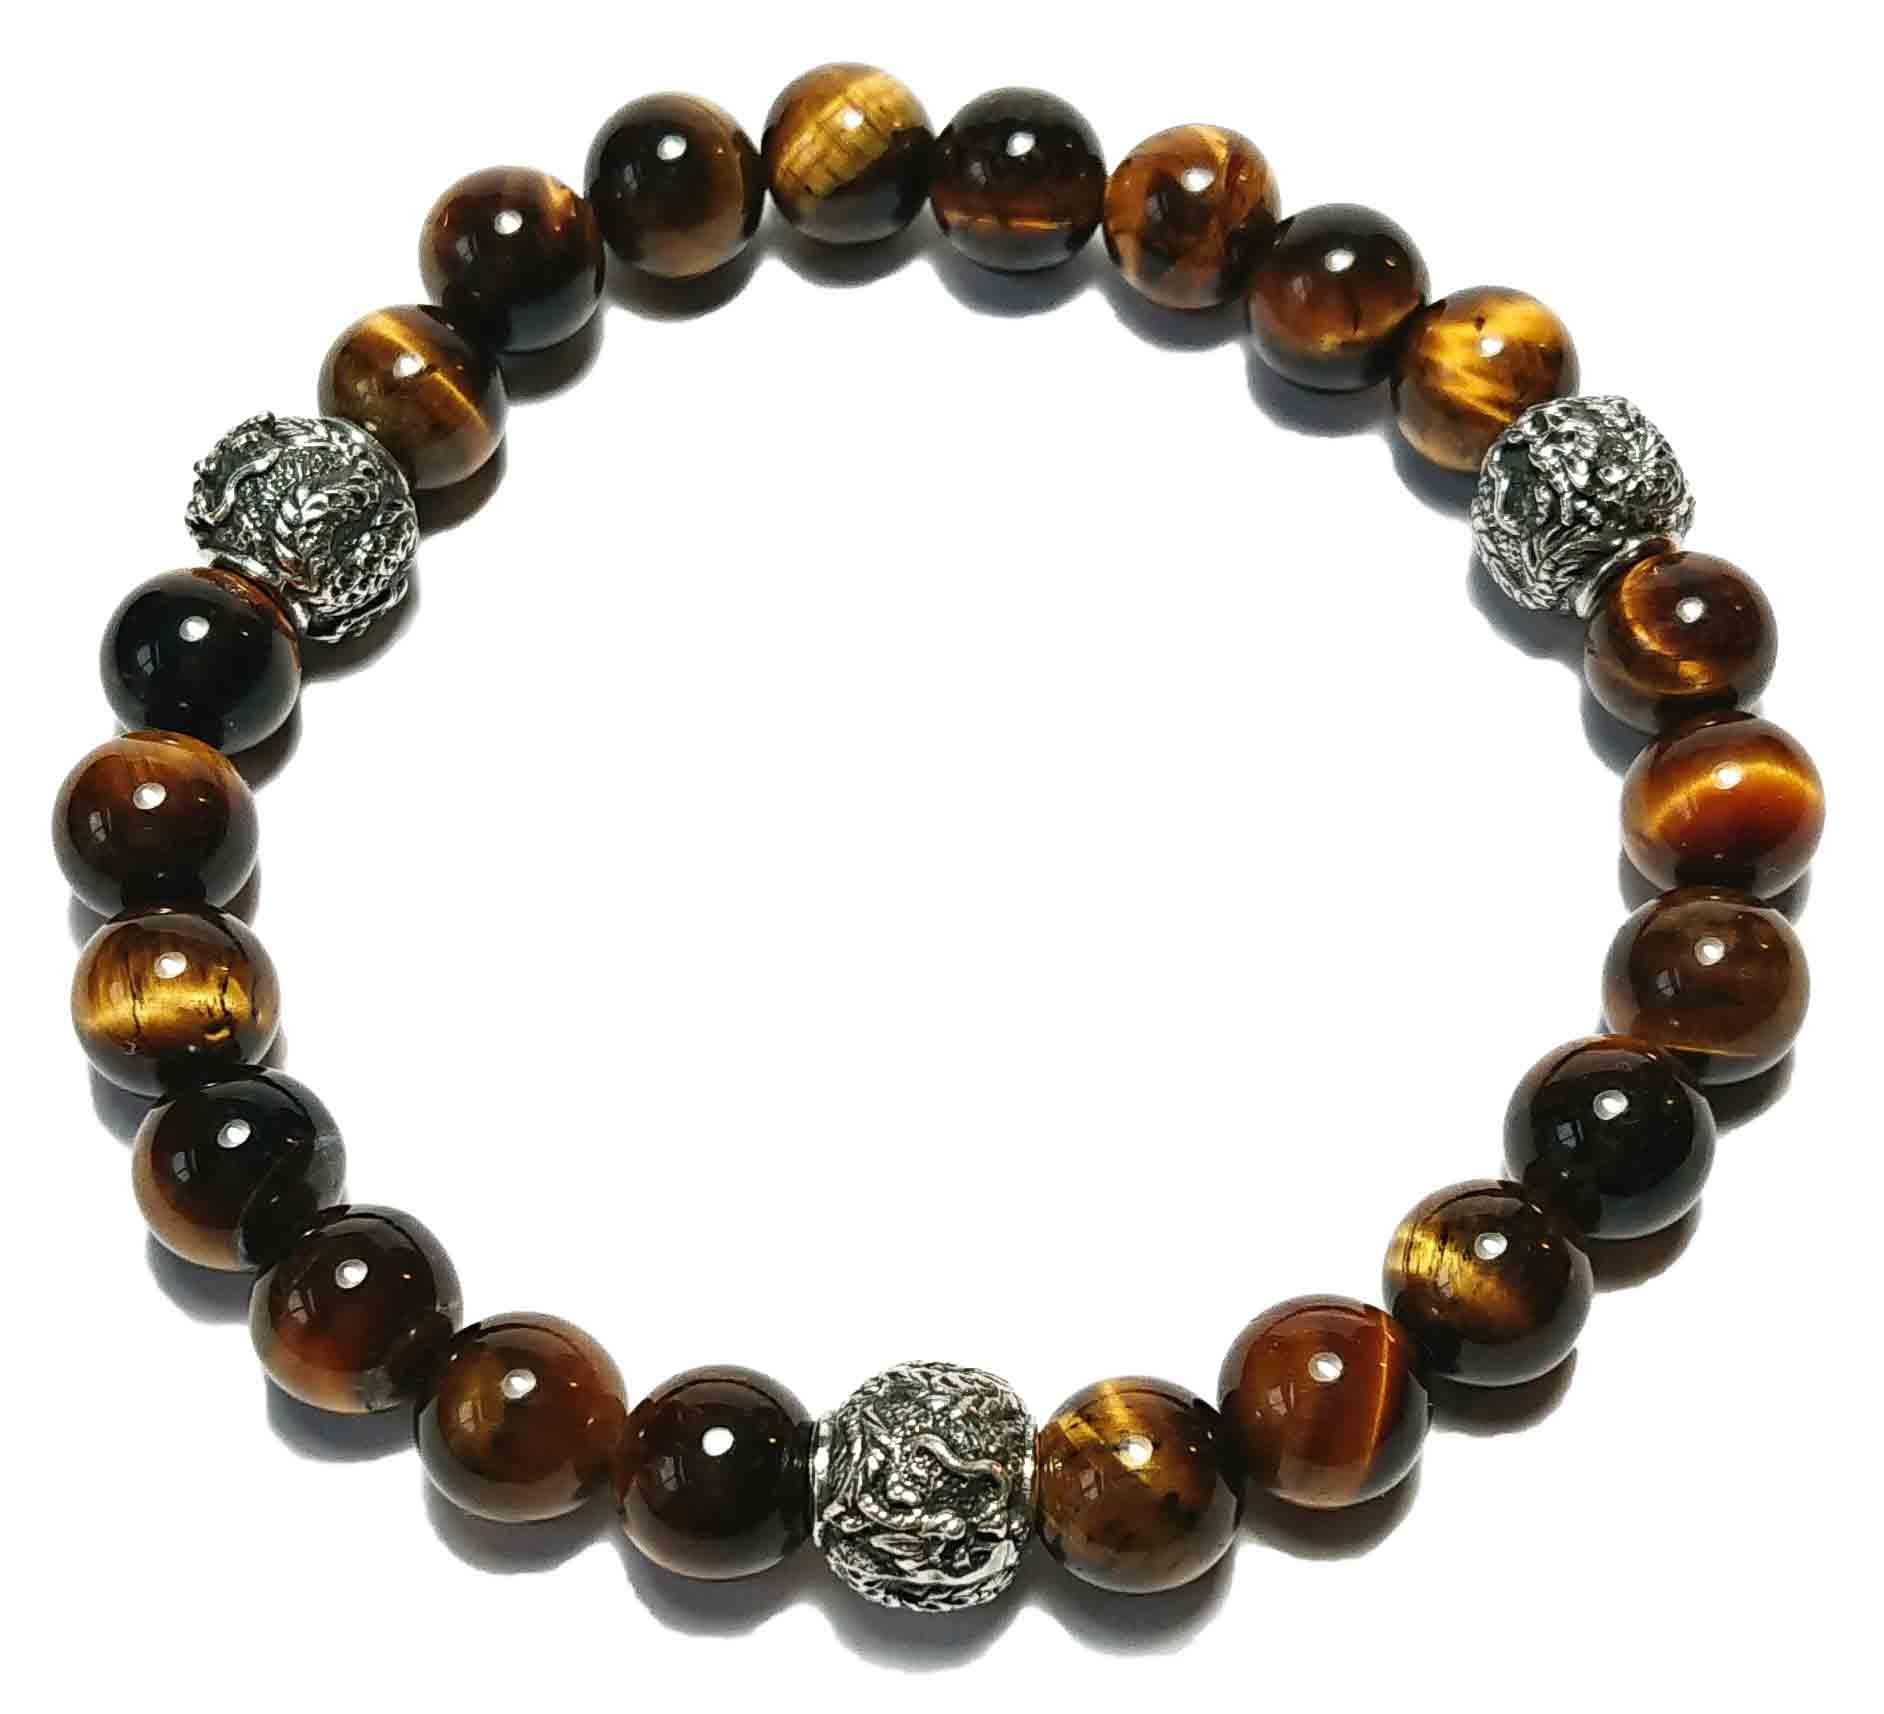 Shenlong (Tigerauge) Armband